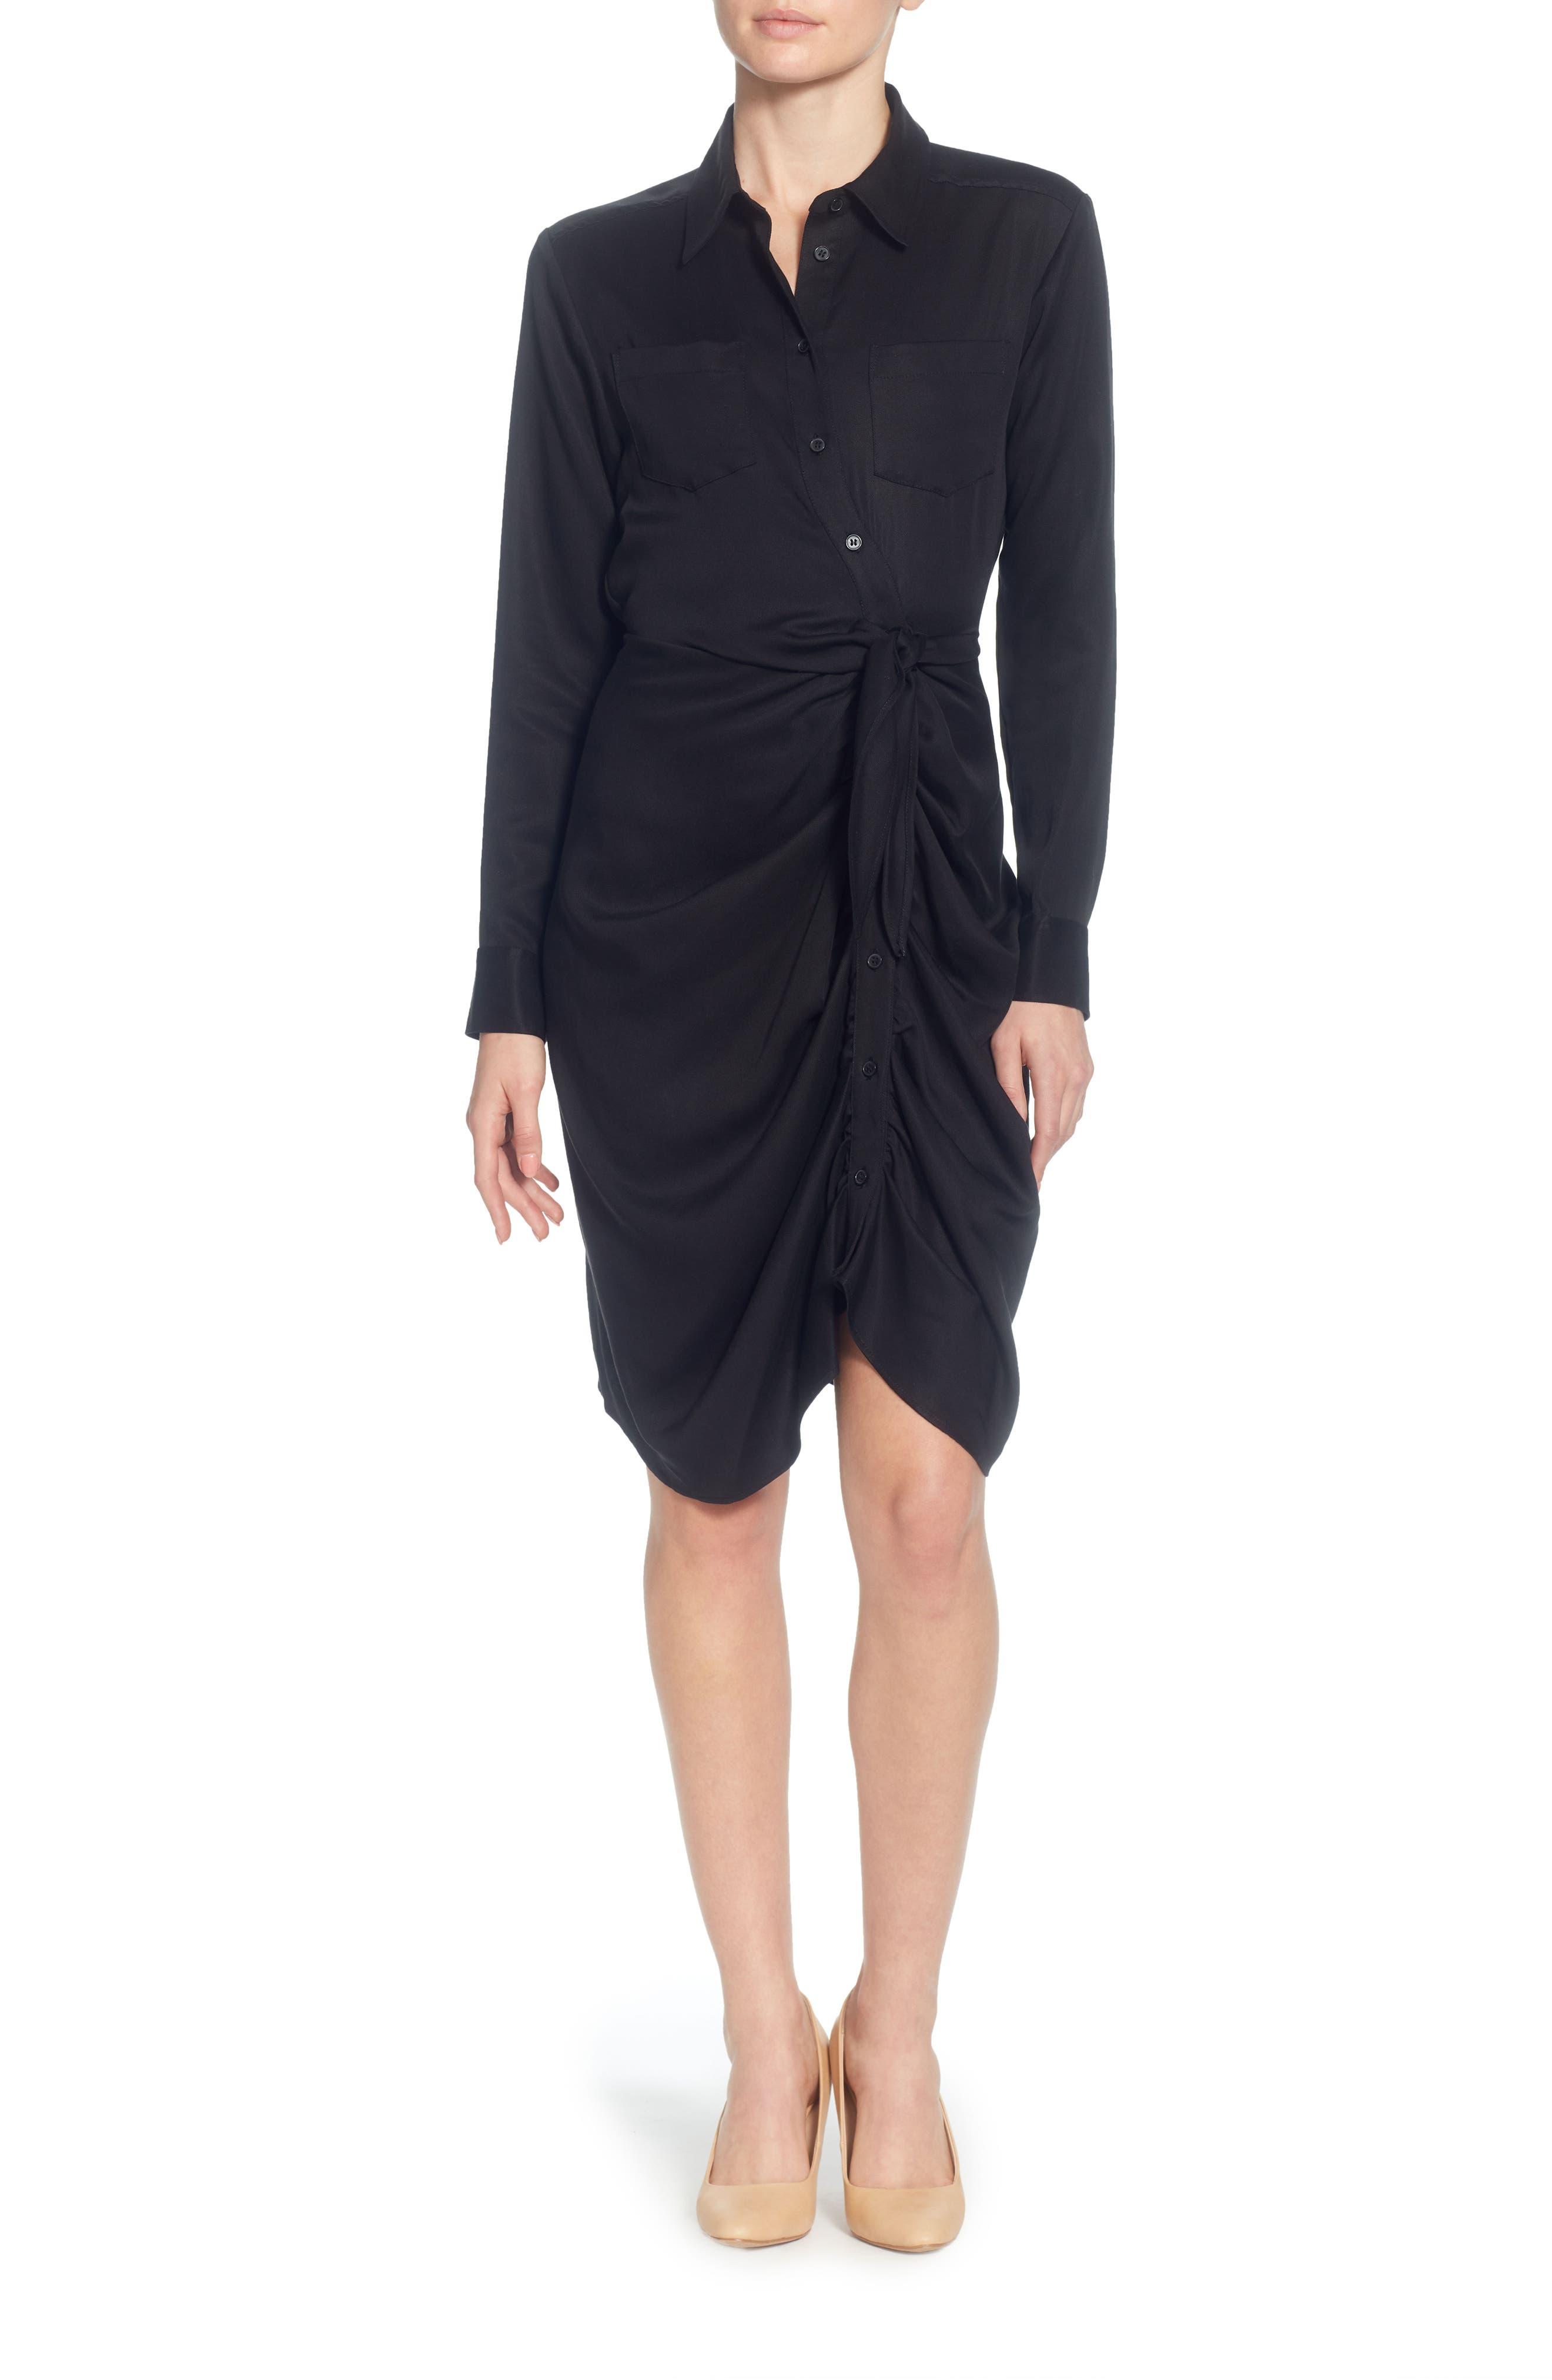 Sloan Tie-Waist Dress,                         Main,                         color, Black